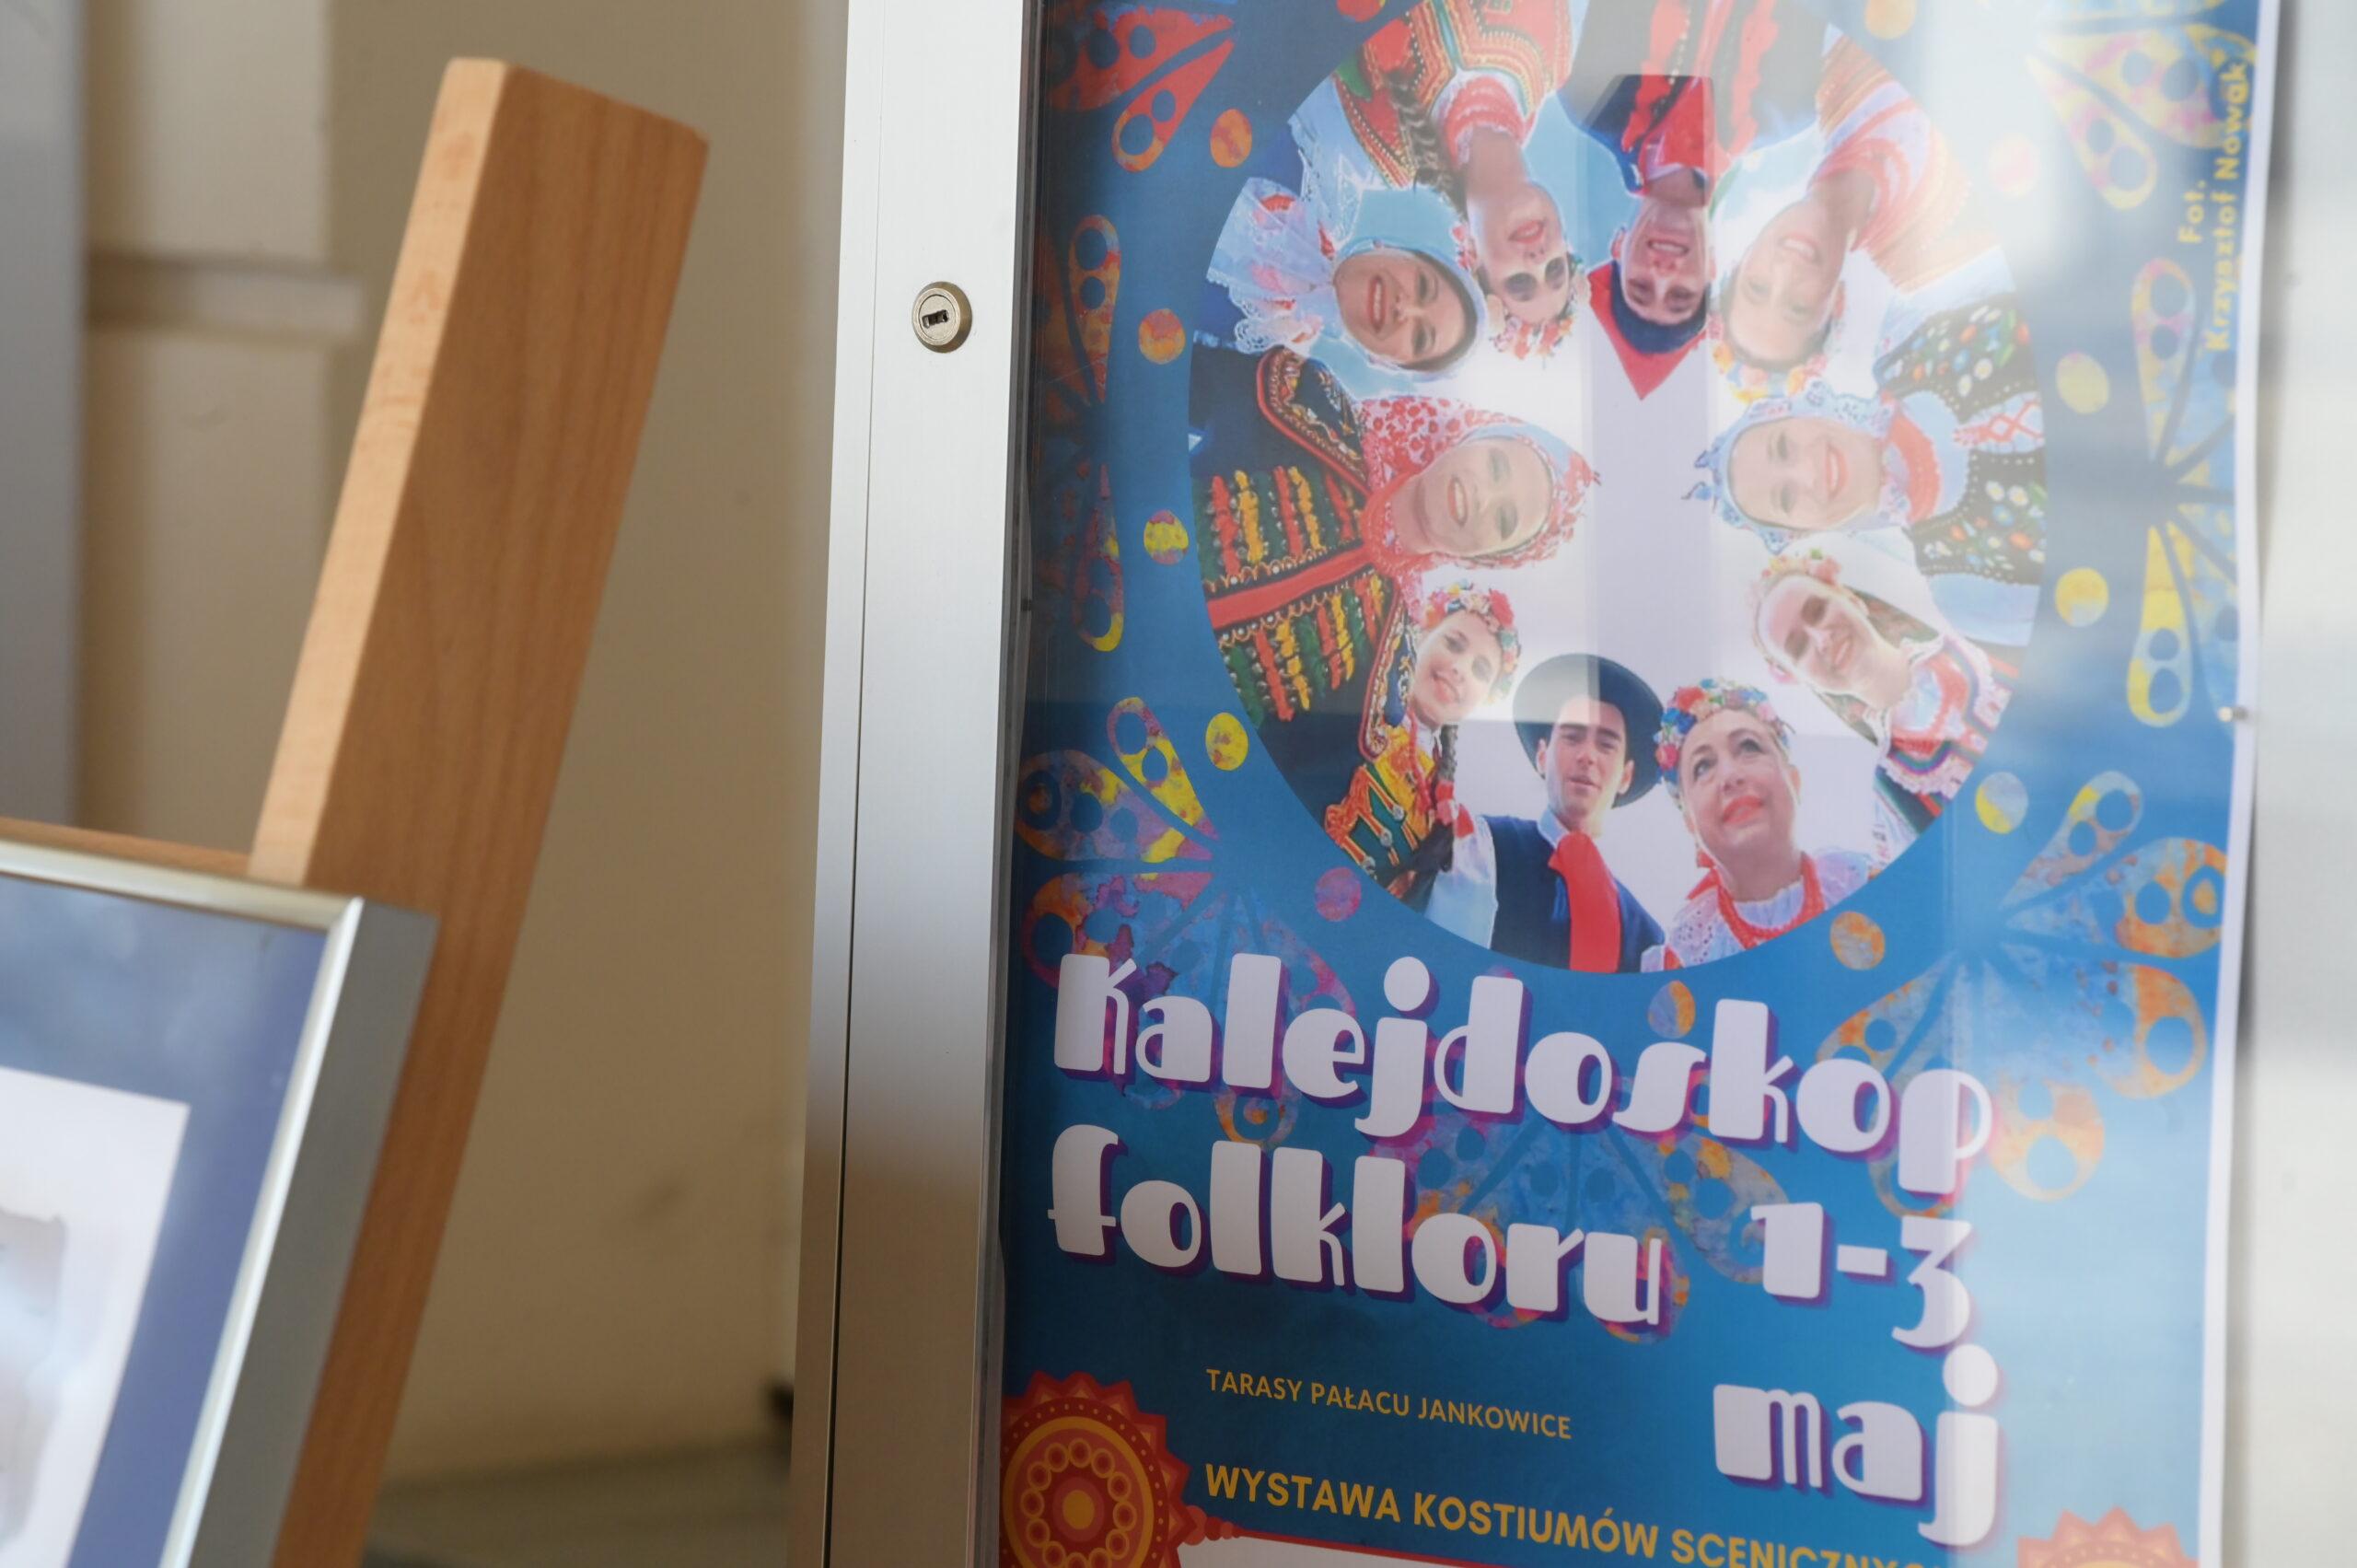 Kalejdoskop folkloru